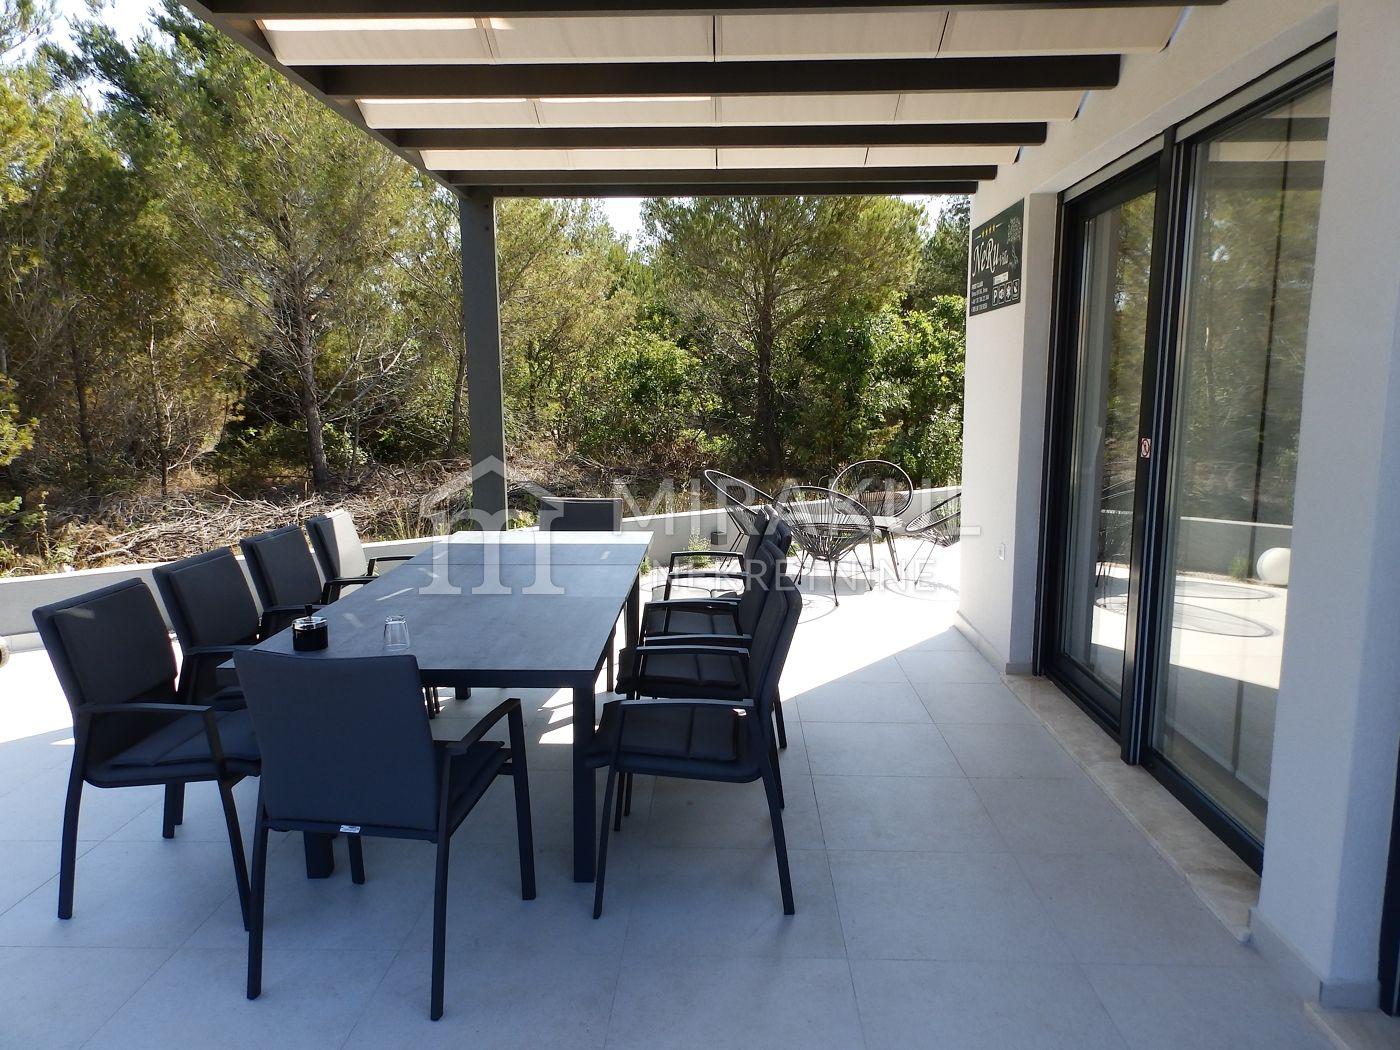 Properties Srima Croatia, Mirakul Real Estate agency, AS-751, Luxurious flat with a pool 2